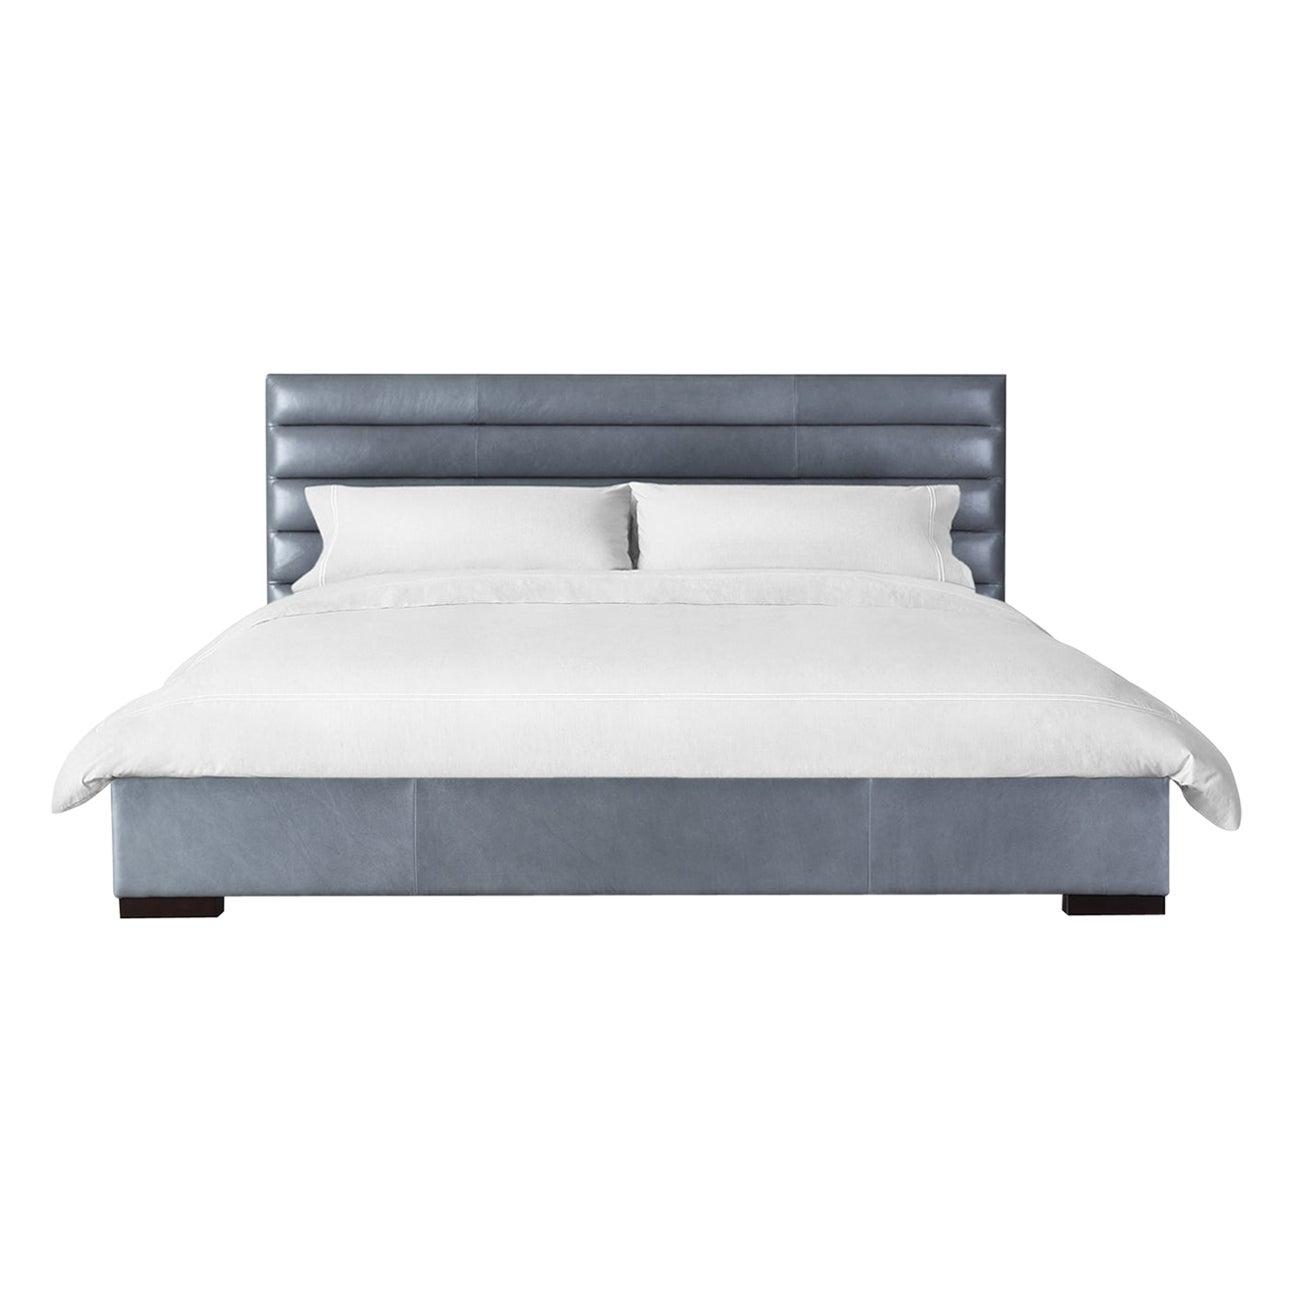 Ben Soleimani Hayworth King Sized Bed